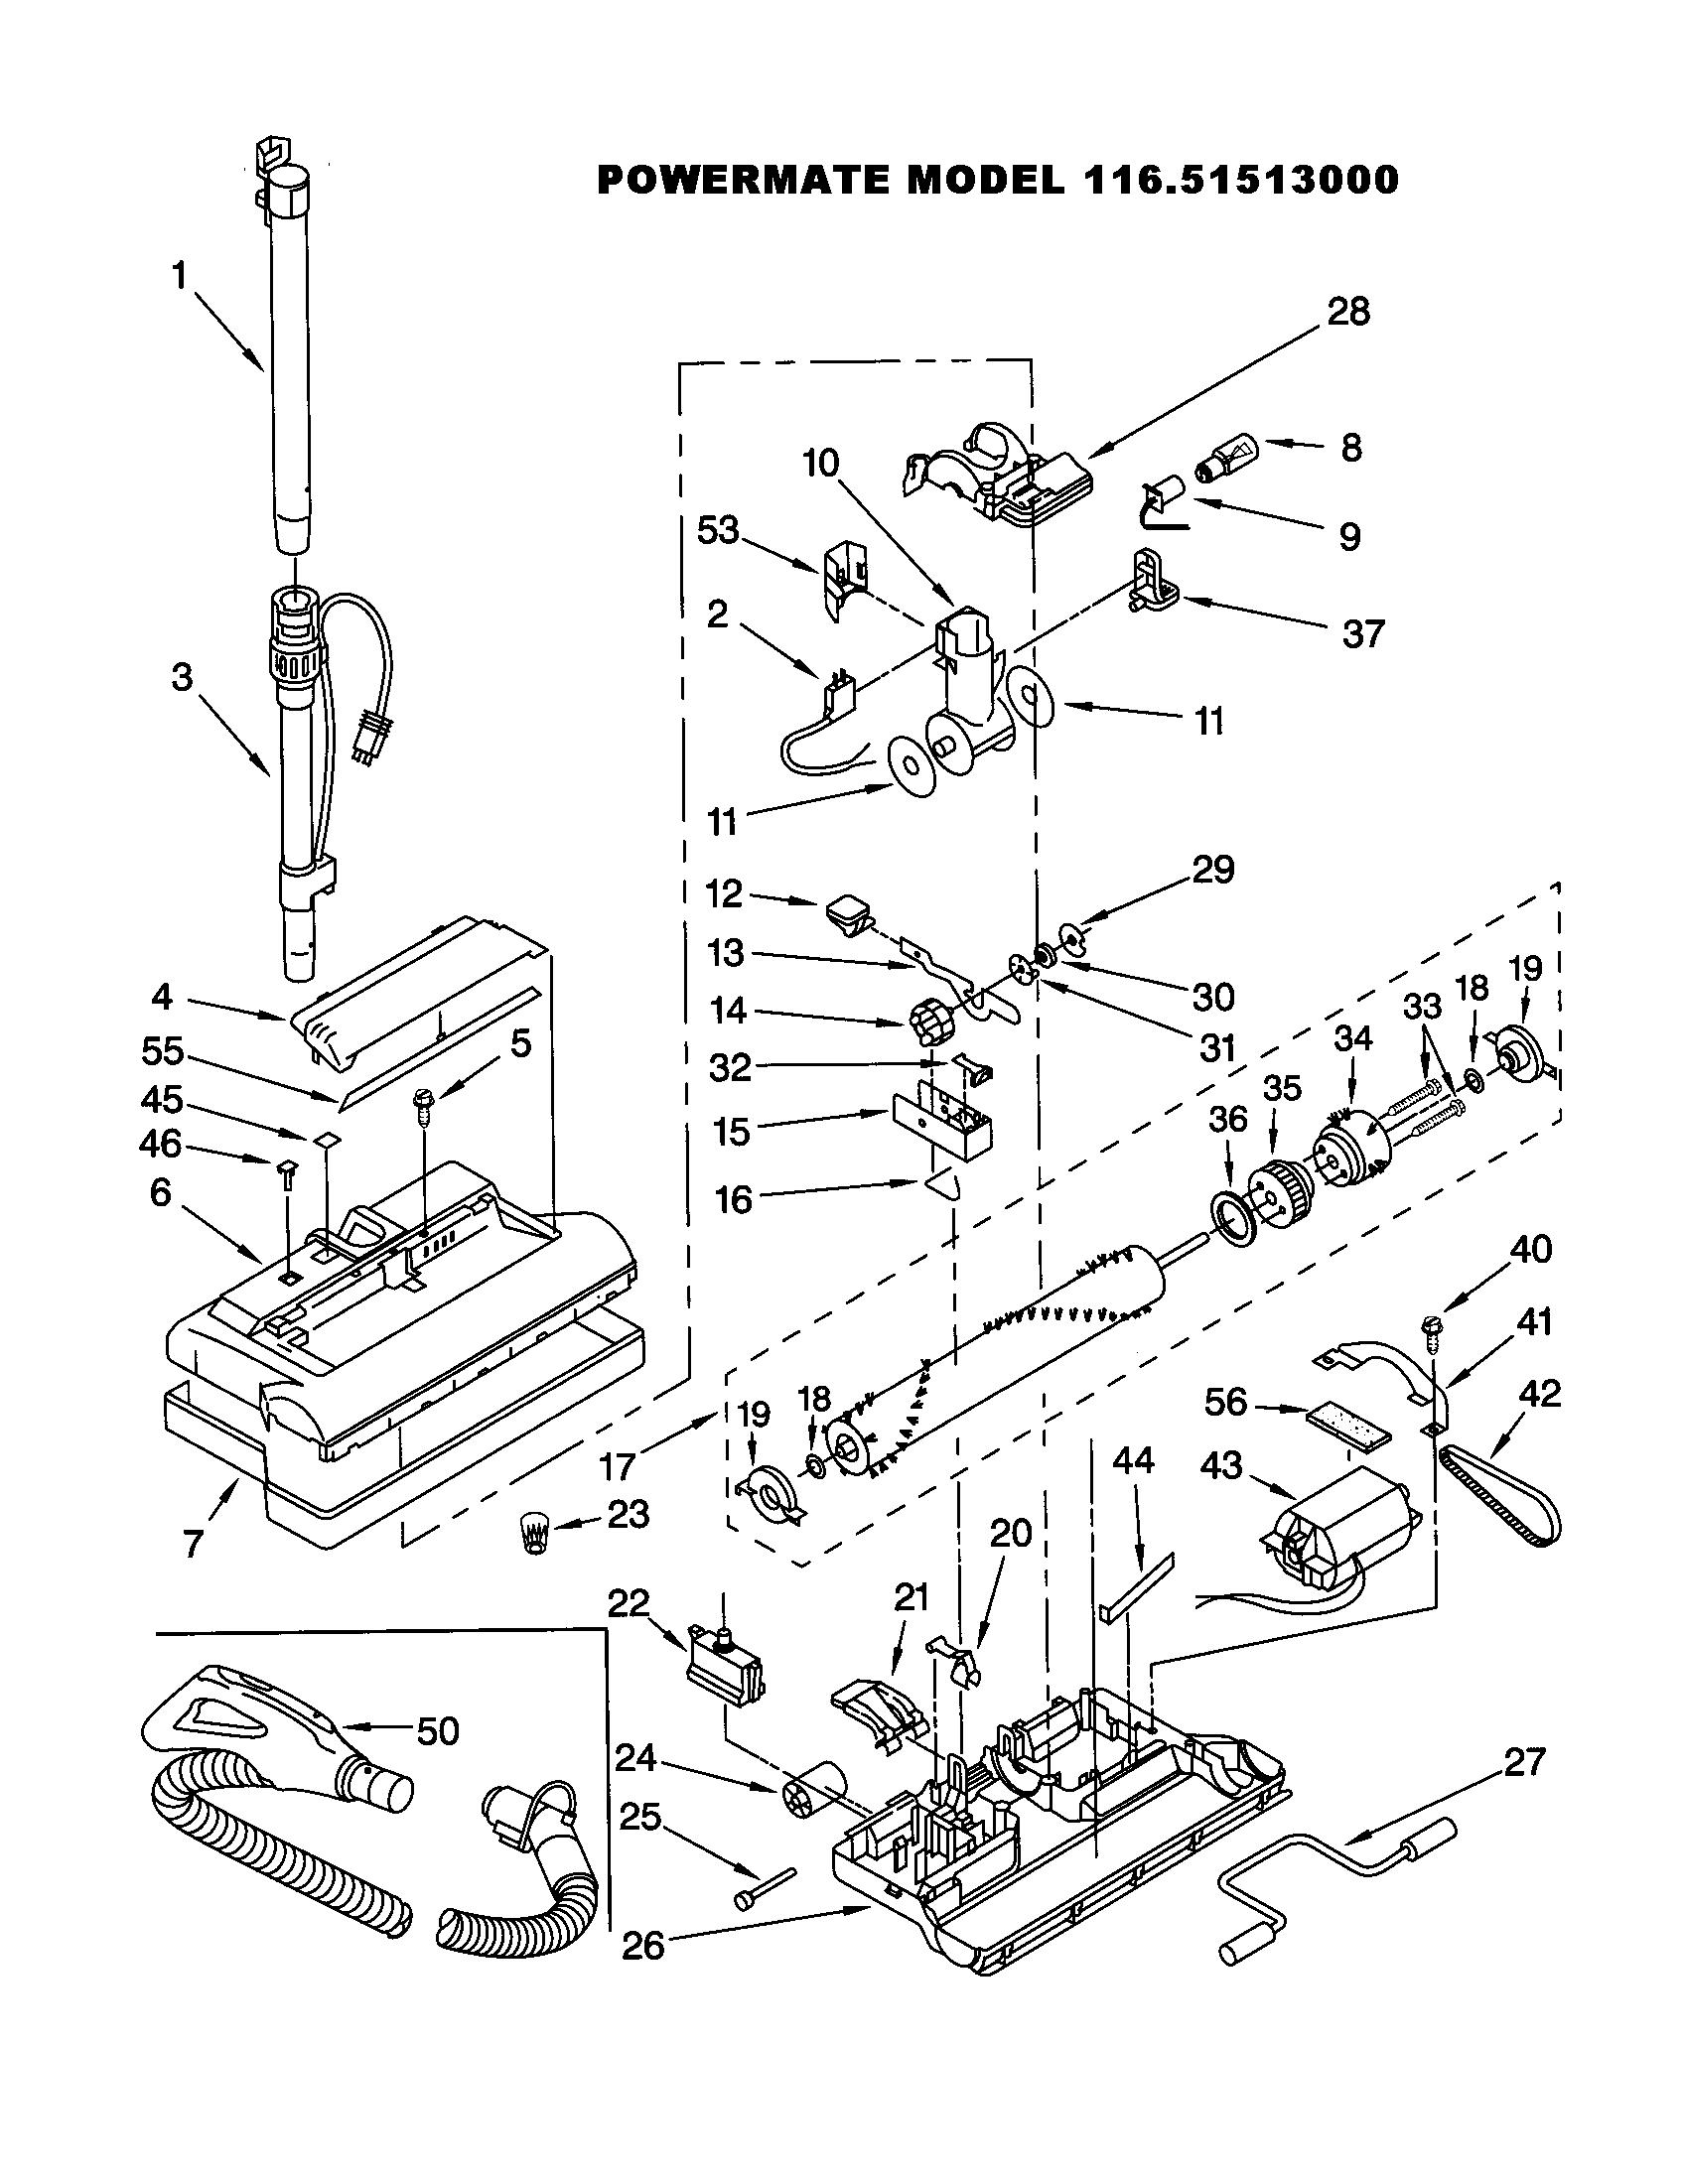 diagram of oreck oreck xl 9200 wiring diagram s wiring diagram data diagram of orca oreck xl 9200 wiring diagram s wiring